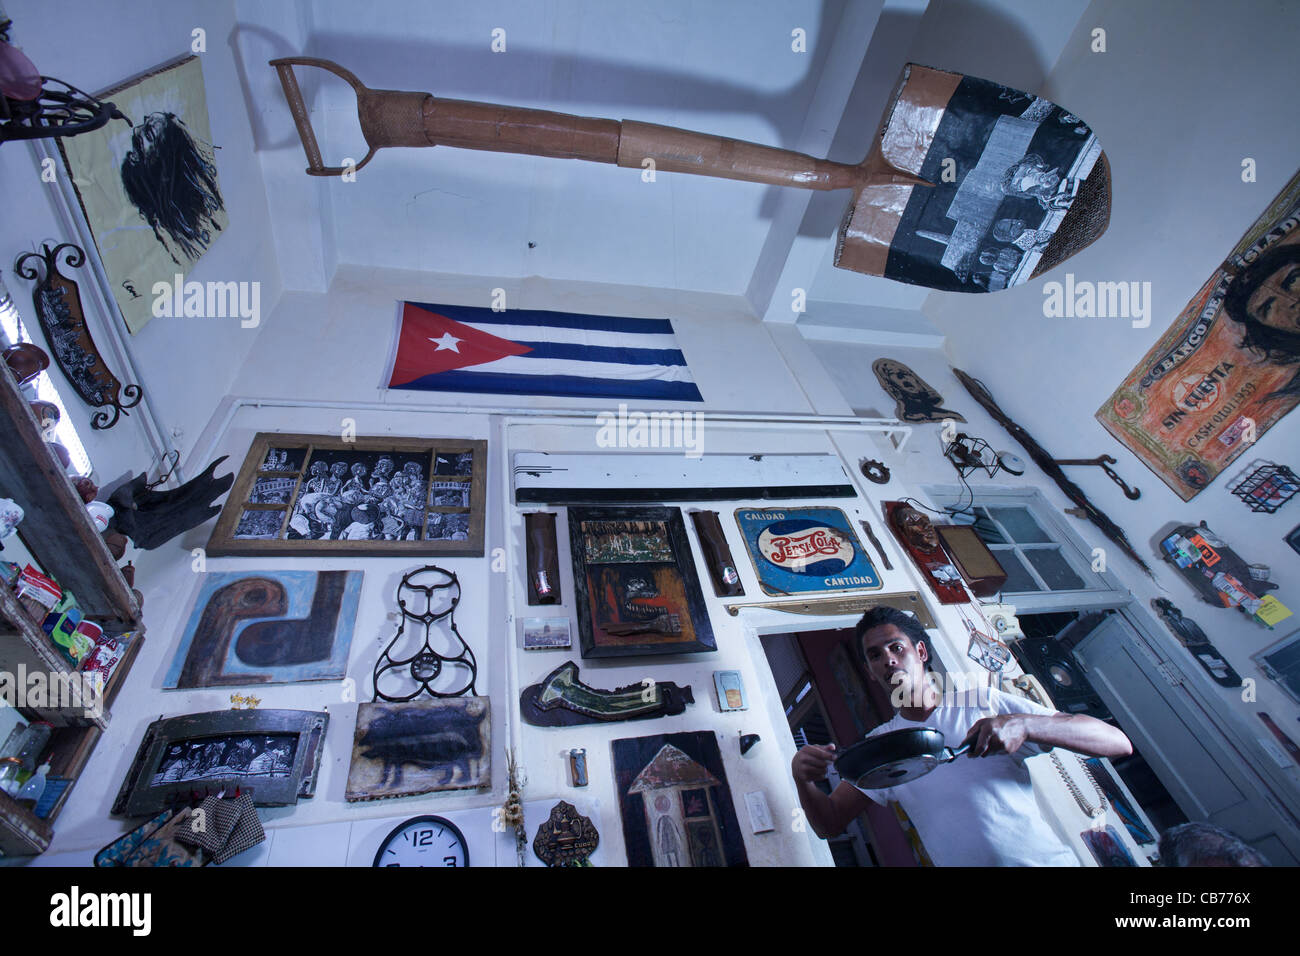 kitchen utensils man Sculptor Havana Cuba - Stock Image